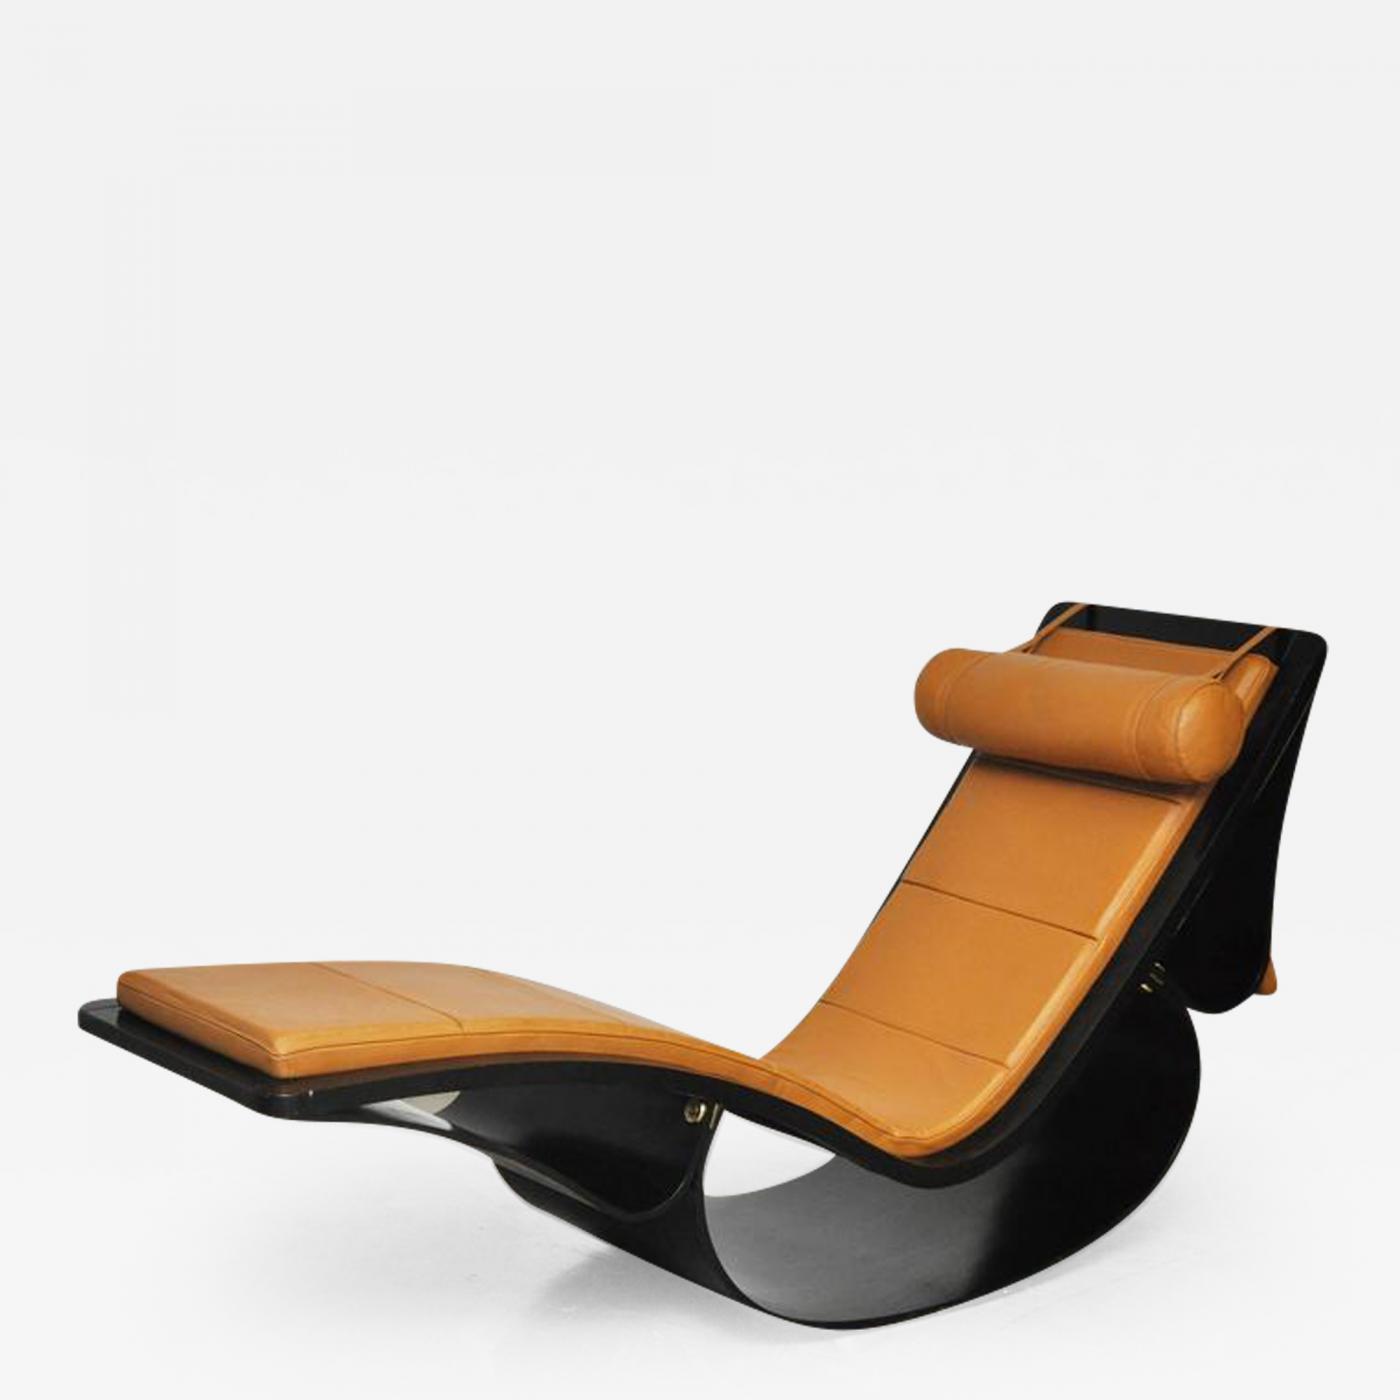 Prime Oscar Niemeyer Rio Rocking Chaise Oscar Niemeyer By Fasem Italy Forskolin Free Trial Chair Design Images Forskolin Free Trialorg